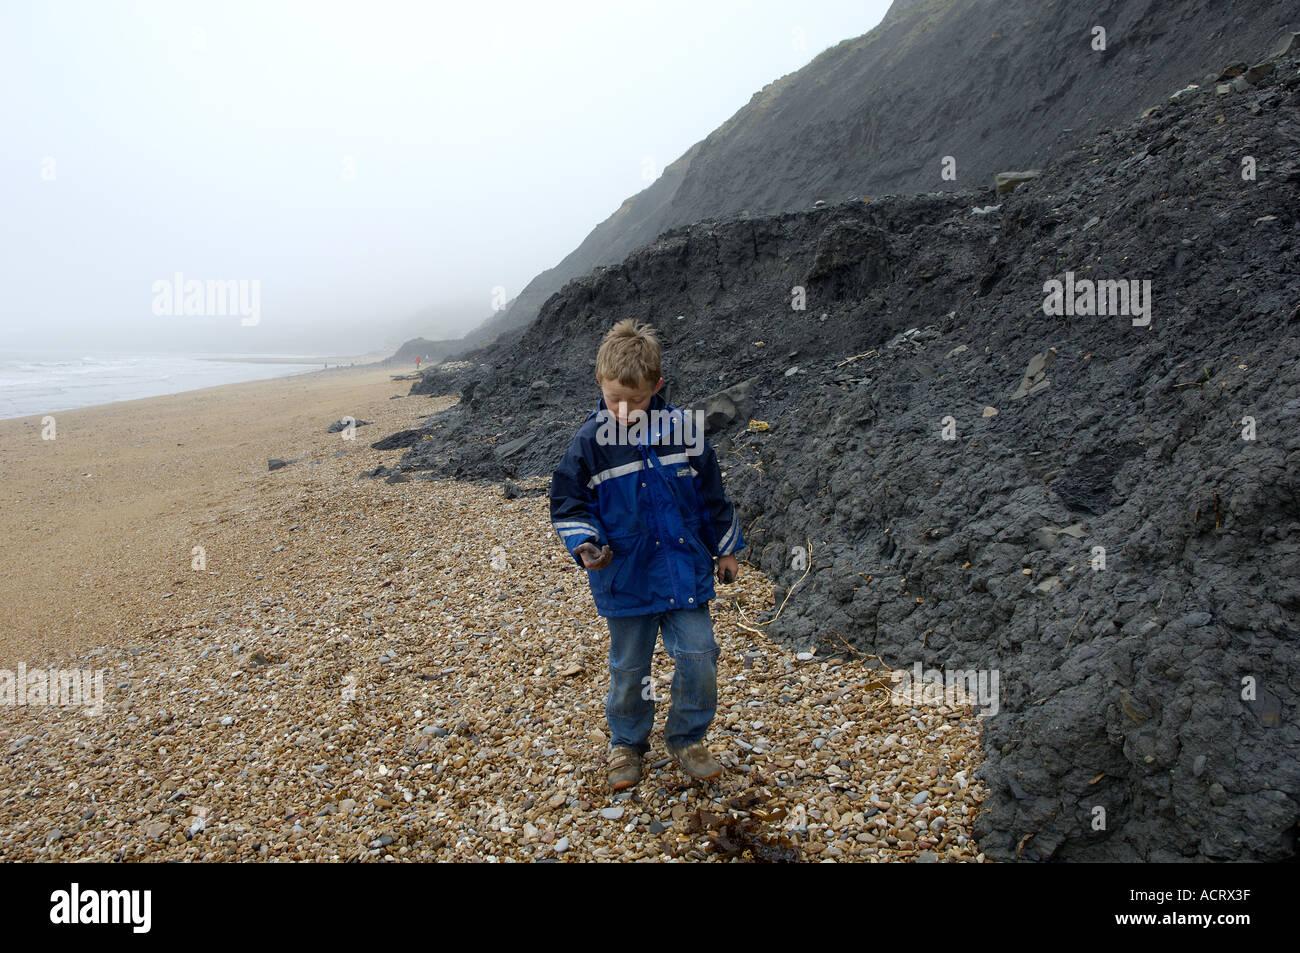 Child at the Jurassic Coast cliffs Charmouth near Lyme Regis Dorset East Devon Coast England Stock Photo